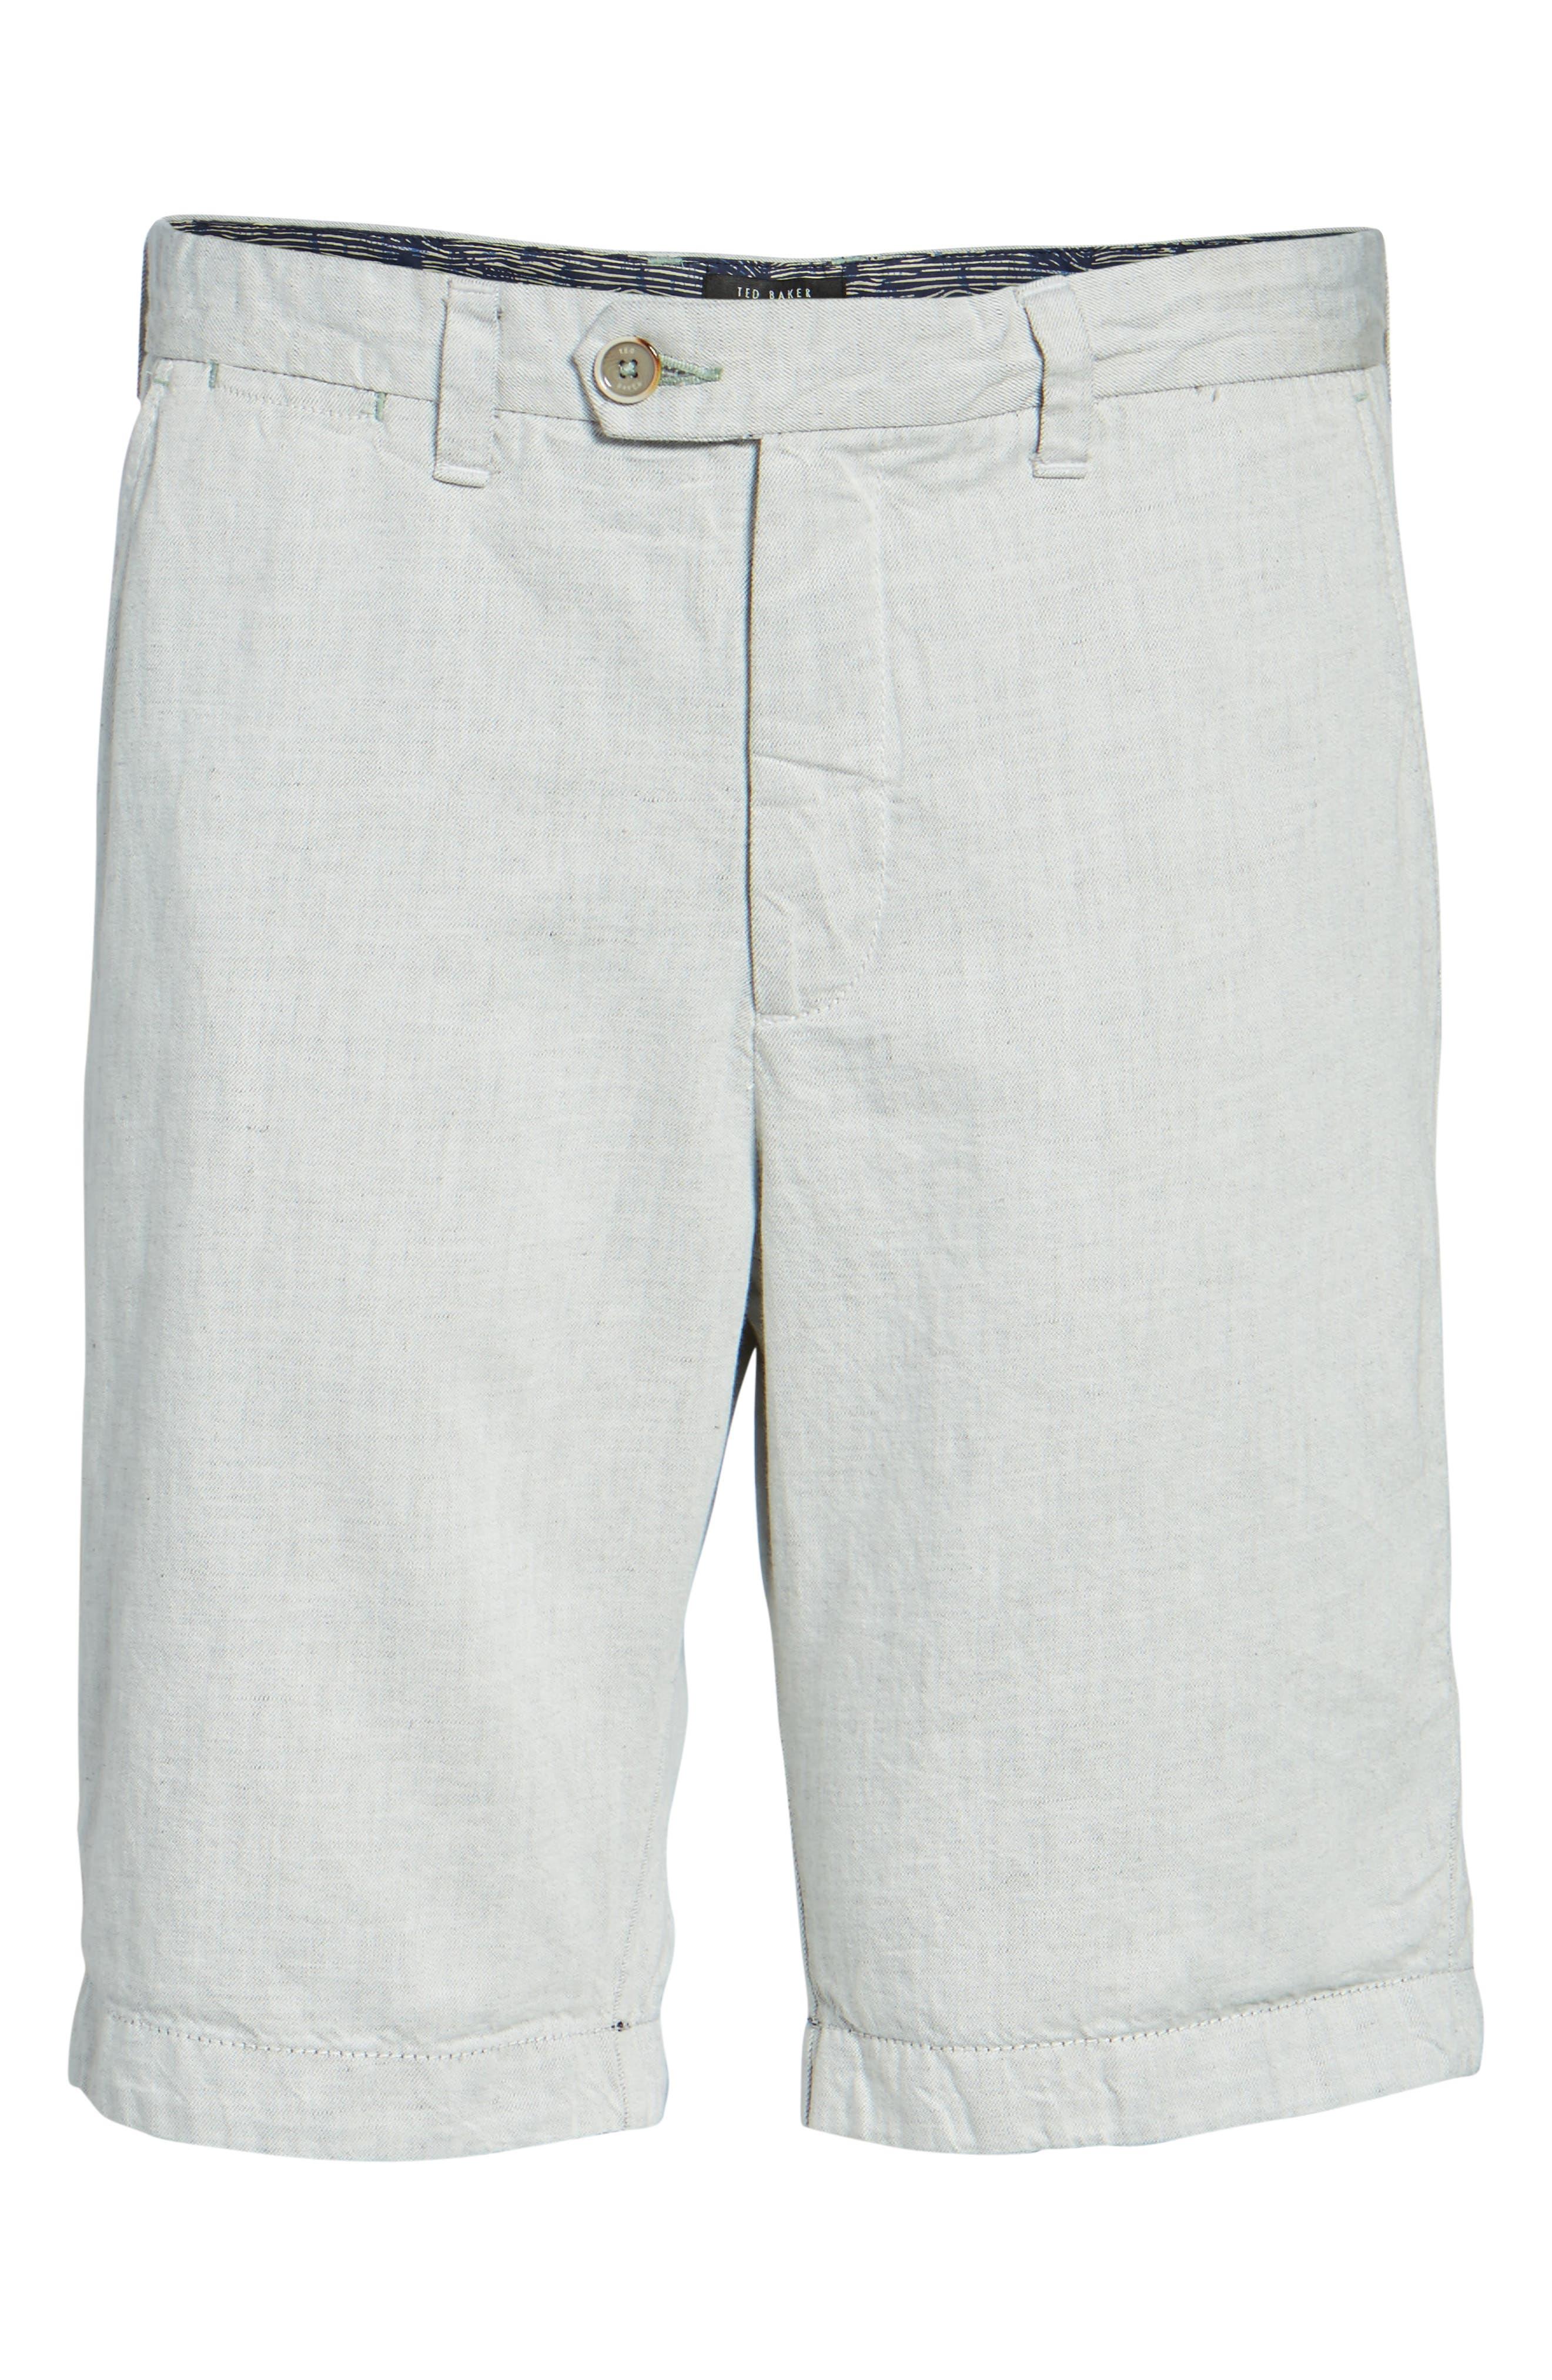 Frisho Cuff Denim Shorts,                             Alternate thumbnail 11, color,